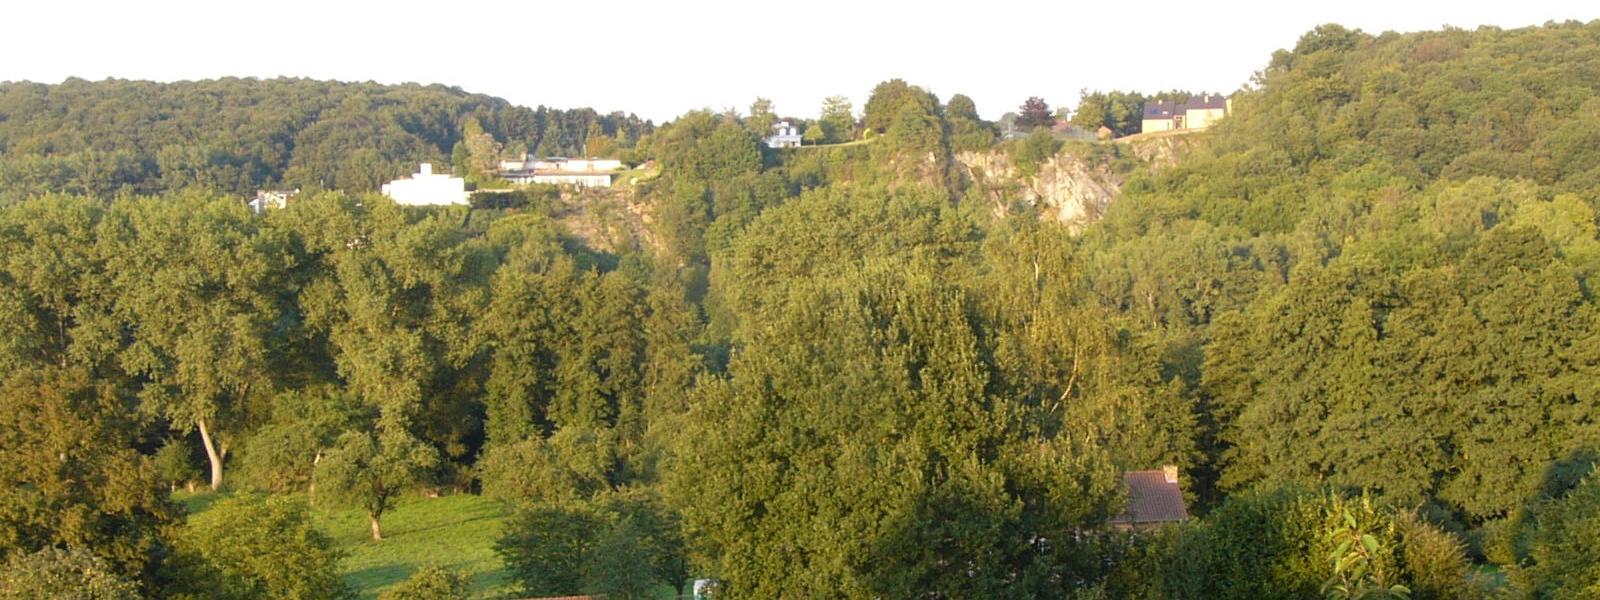 Commune de Ham-sur-Heure-Nalinnes | campagne de jamioulx